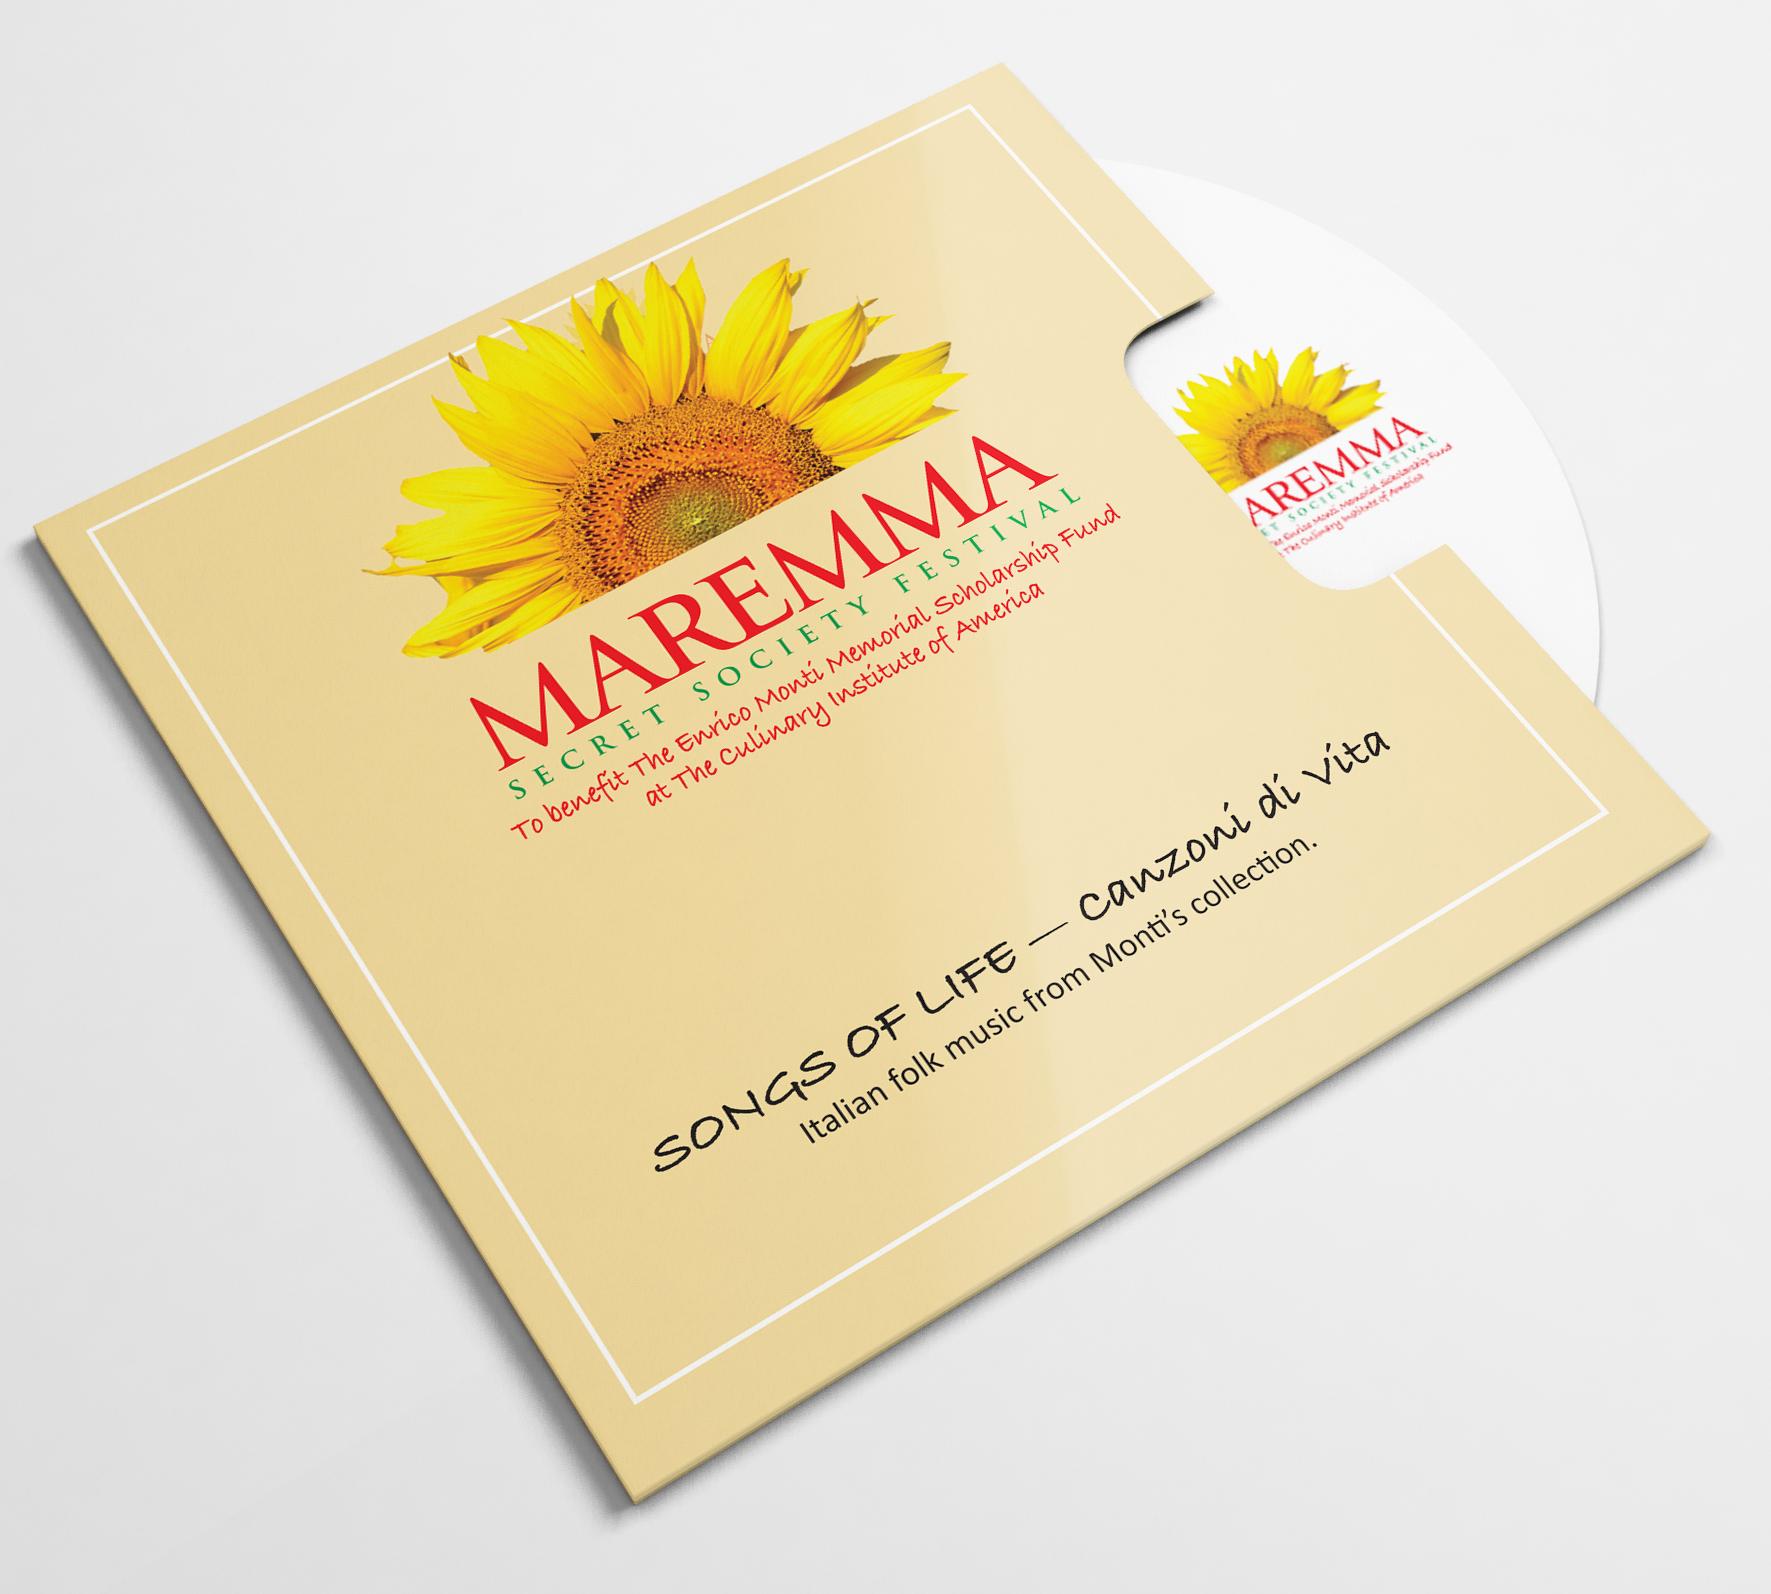 Maremma CD